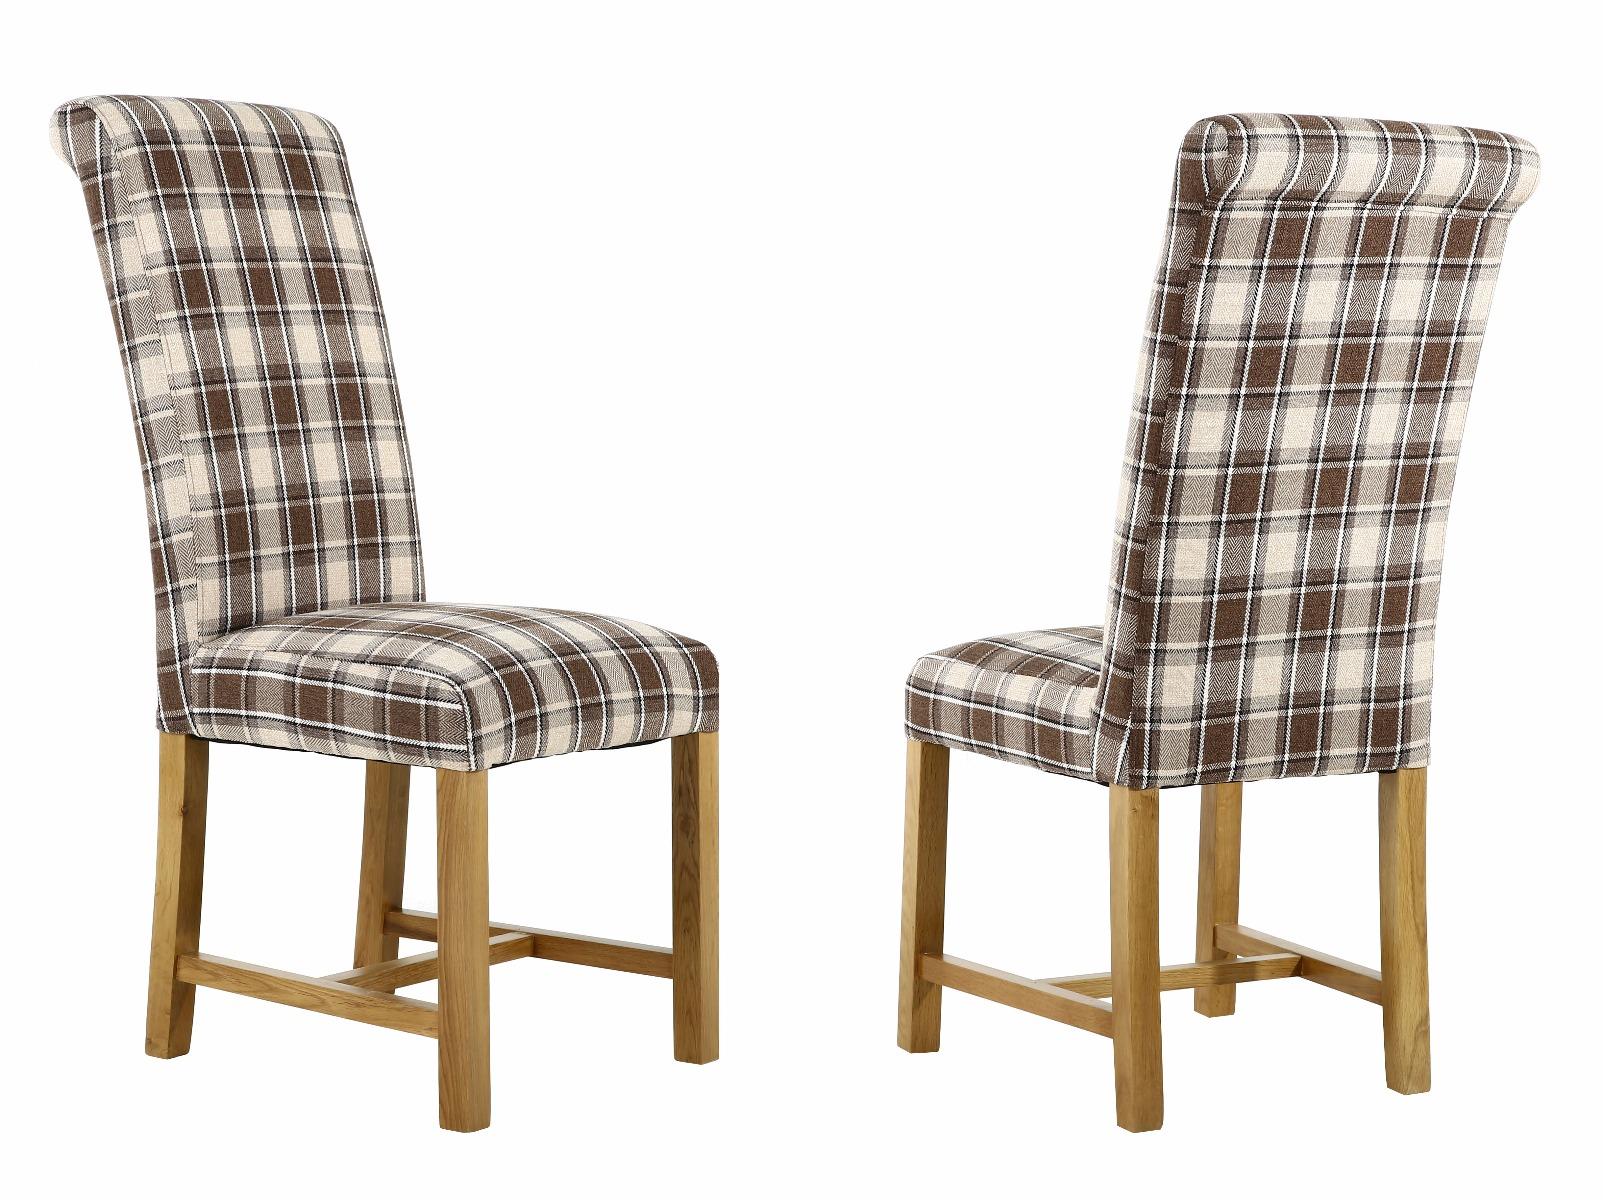 Harrogate Check Brown Herringbone Fabric Dining Chair with Oak Legs